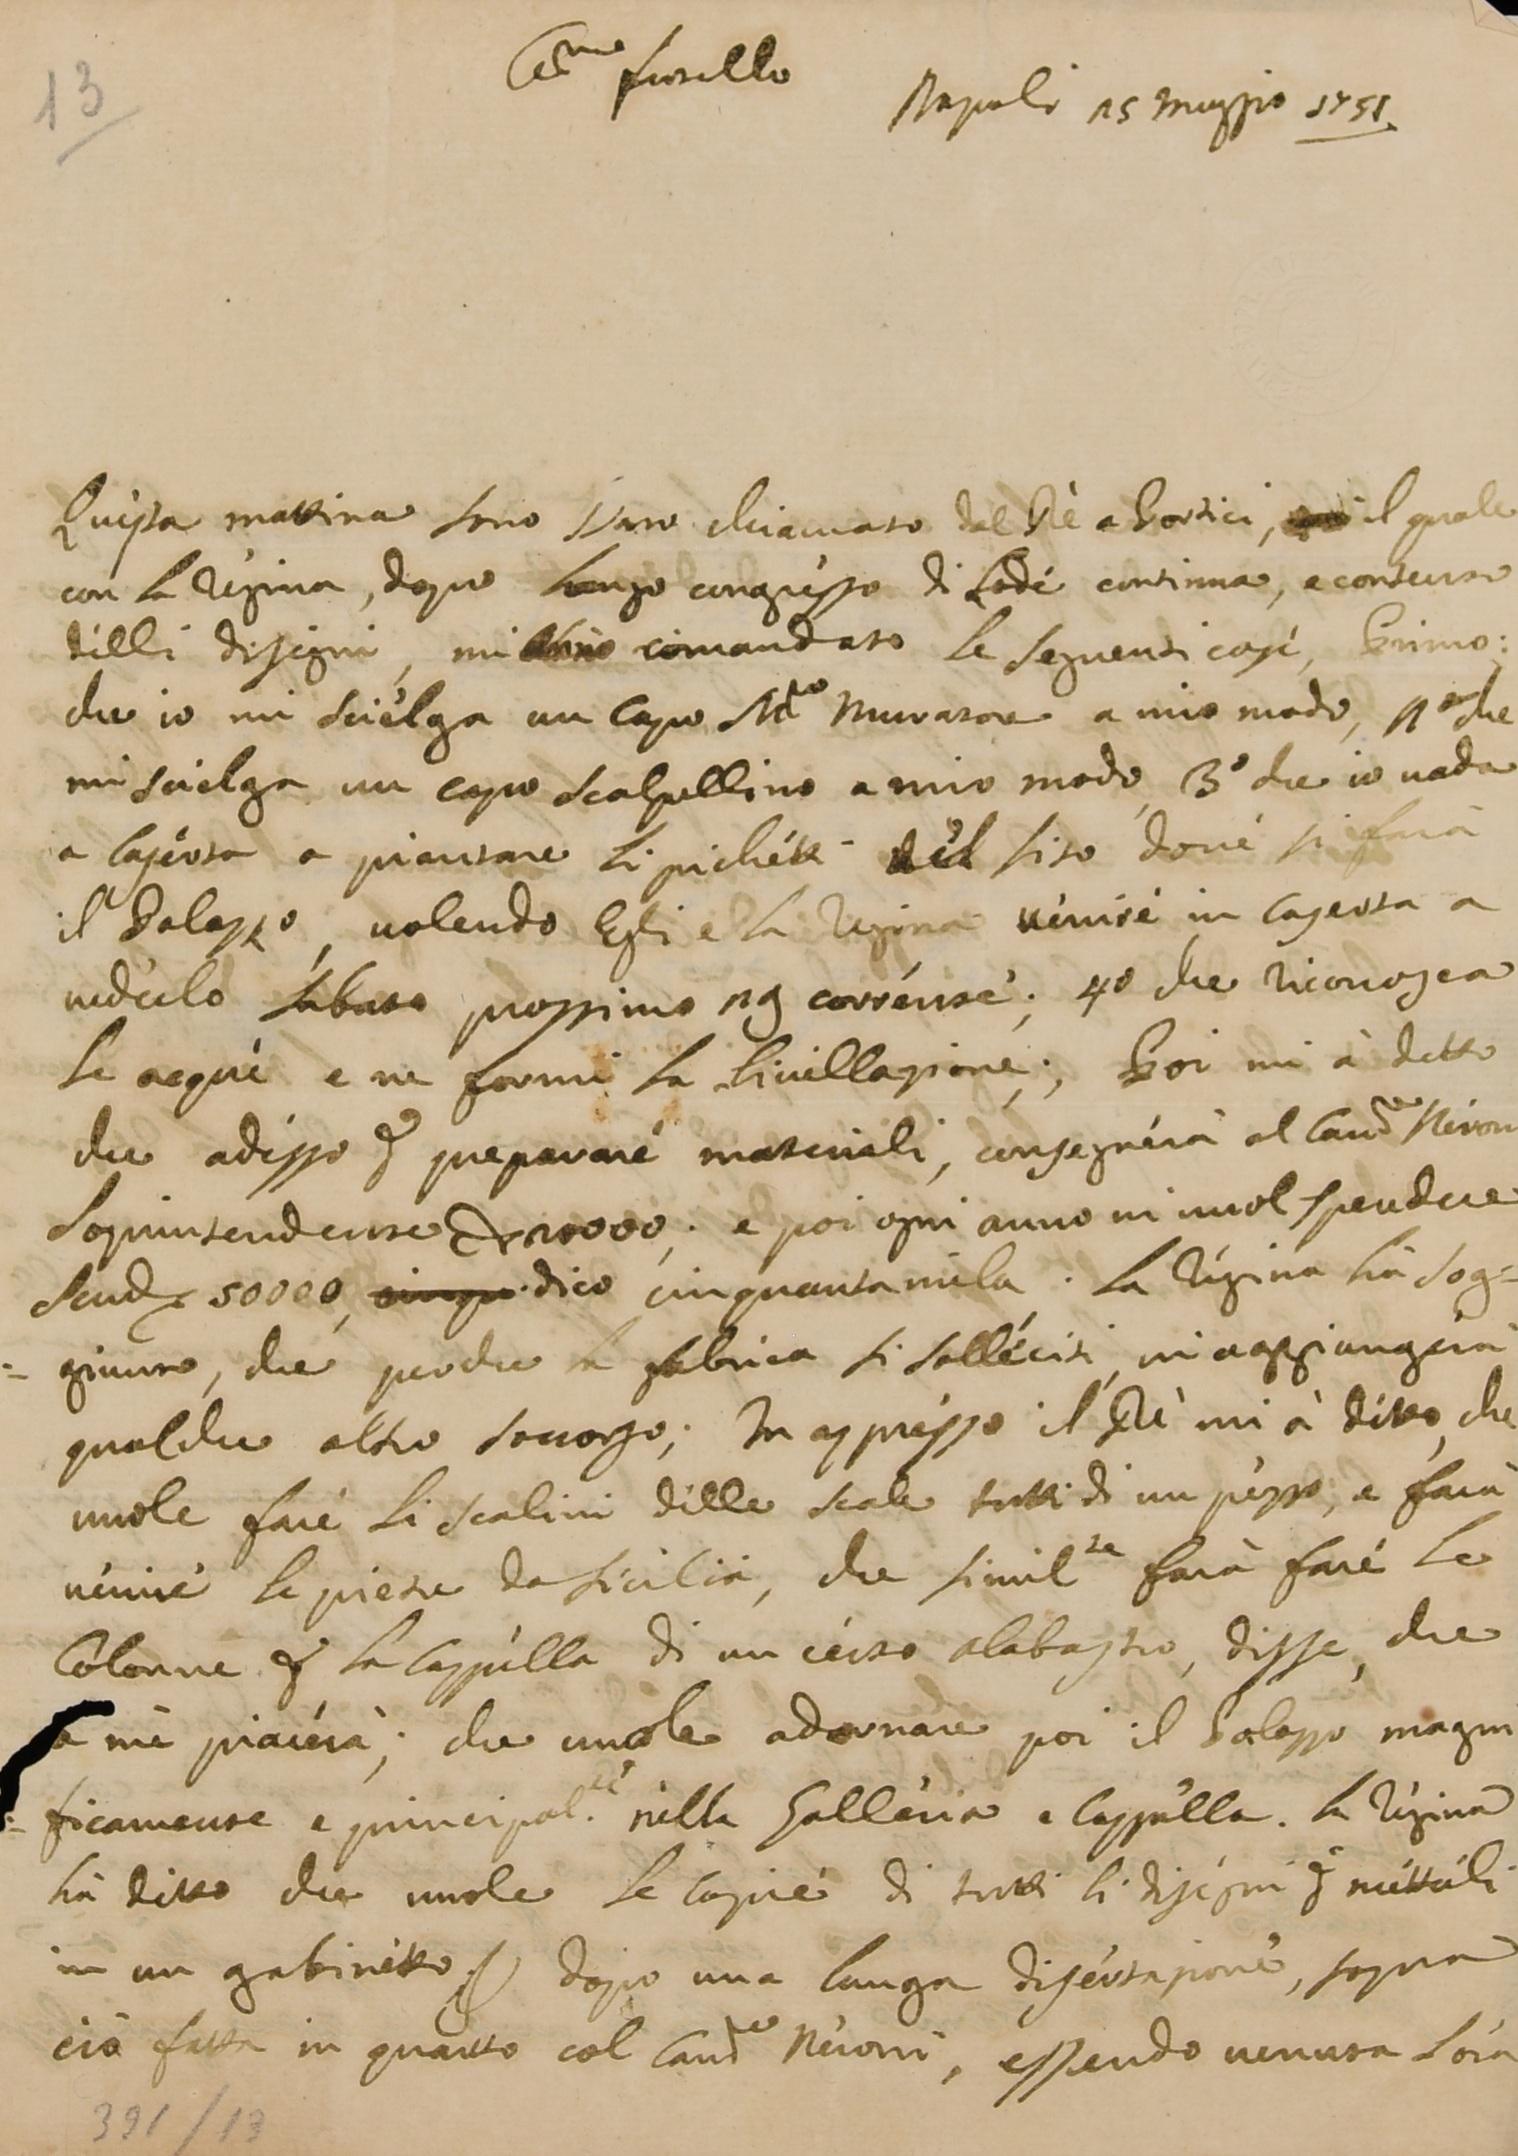 lettera di Vanvitelli